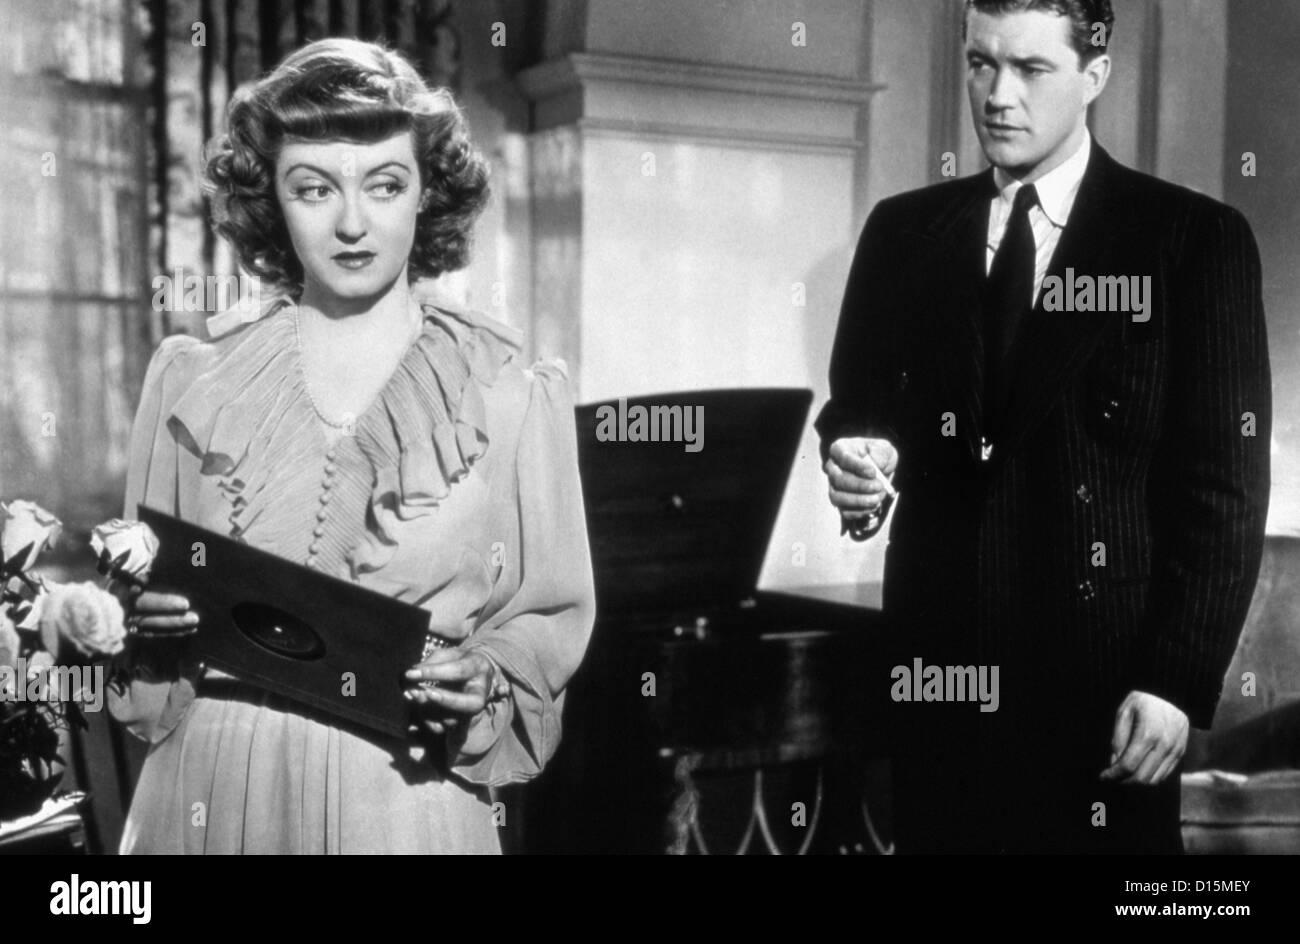 IN THIS OUR LIFE (1942) BETTE DAVIS, DENNIS MORGAN, JOHN HUSTON (DIR) IOLF 003 MOVIESTORE COLLECTION LTD - Stock Image